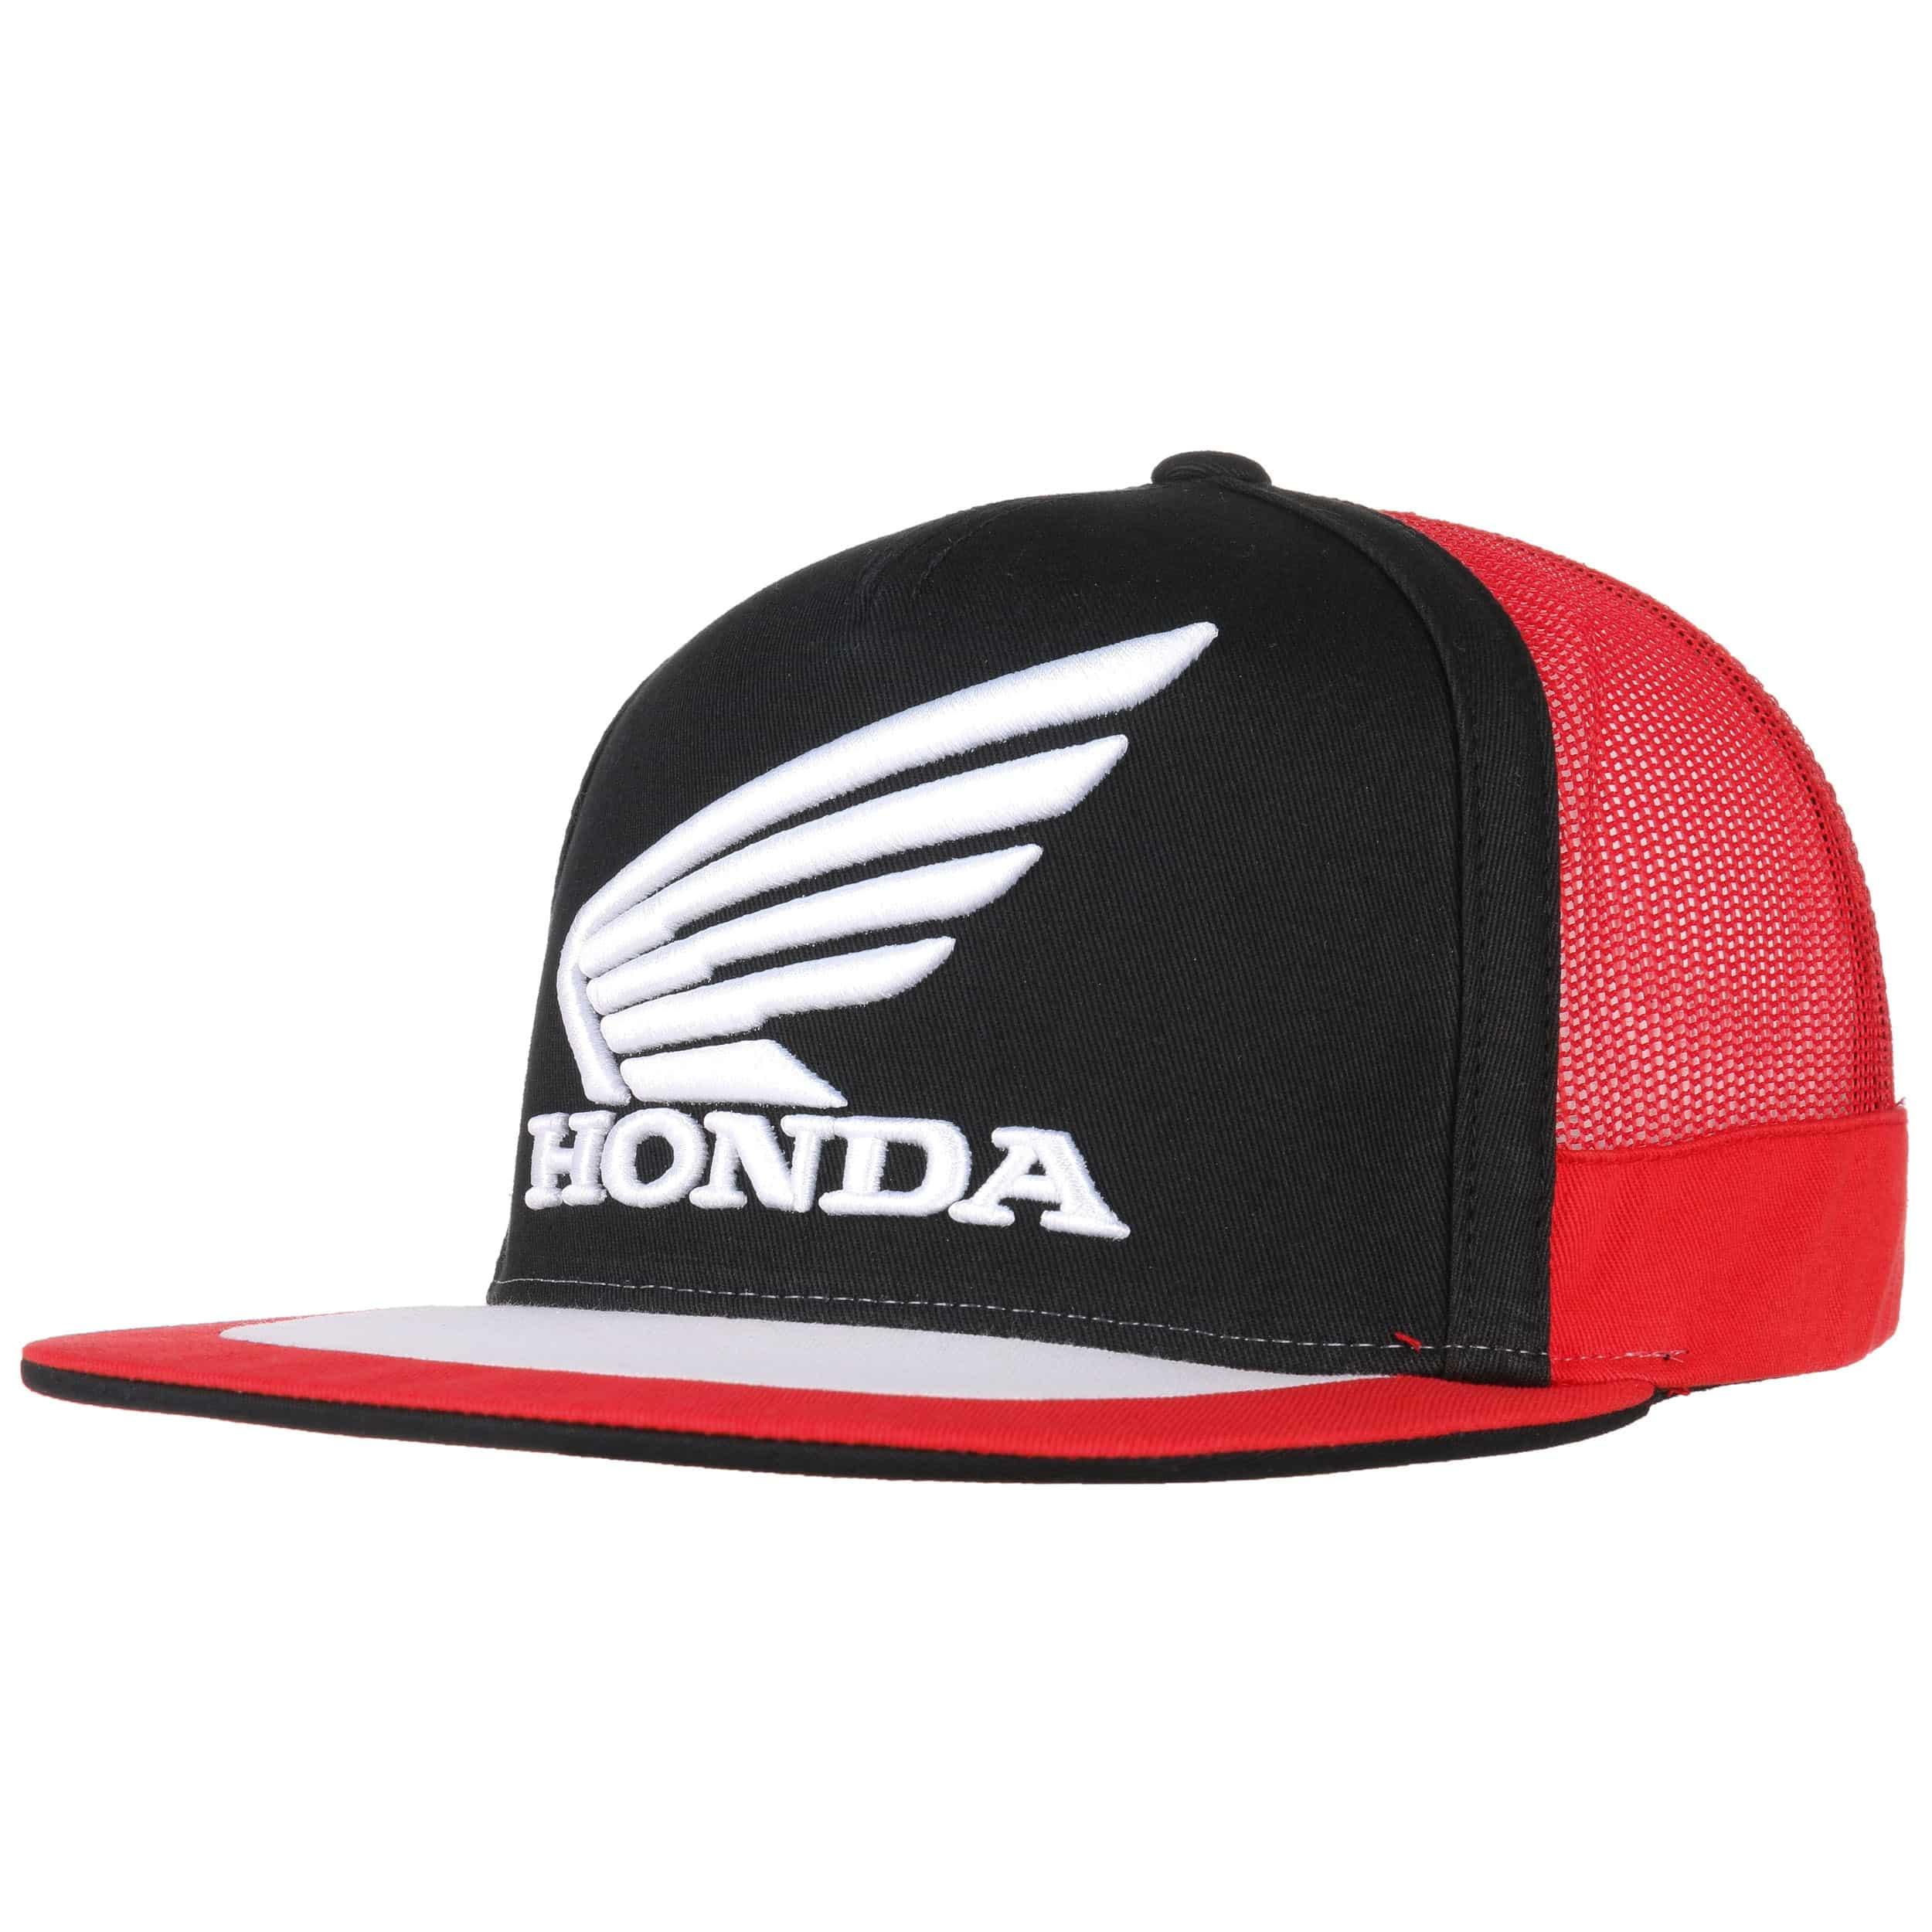 Gorra Honda Trucker by FOX - Gorras - sombreroshop.es 32fed89ebde